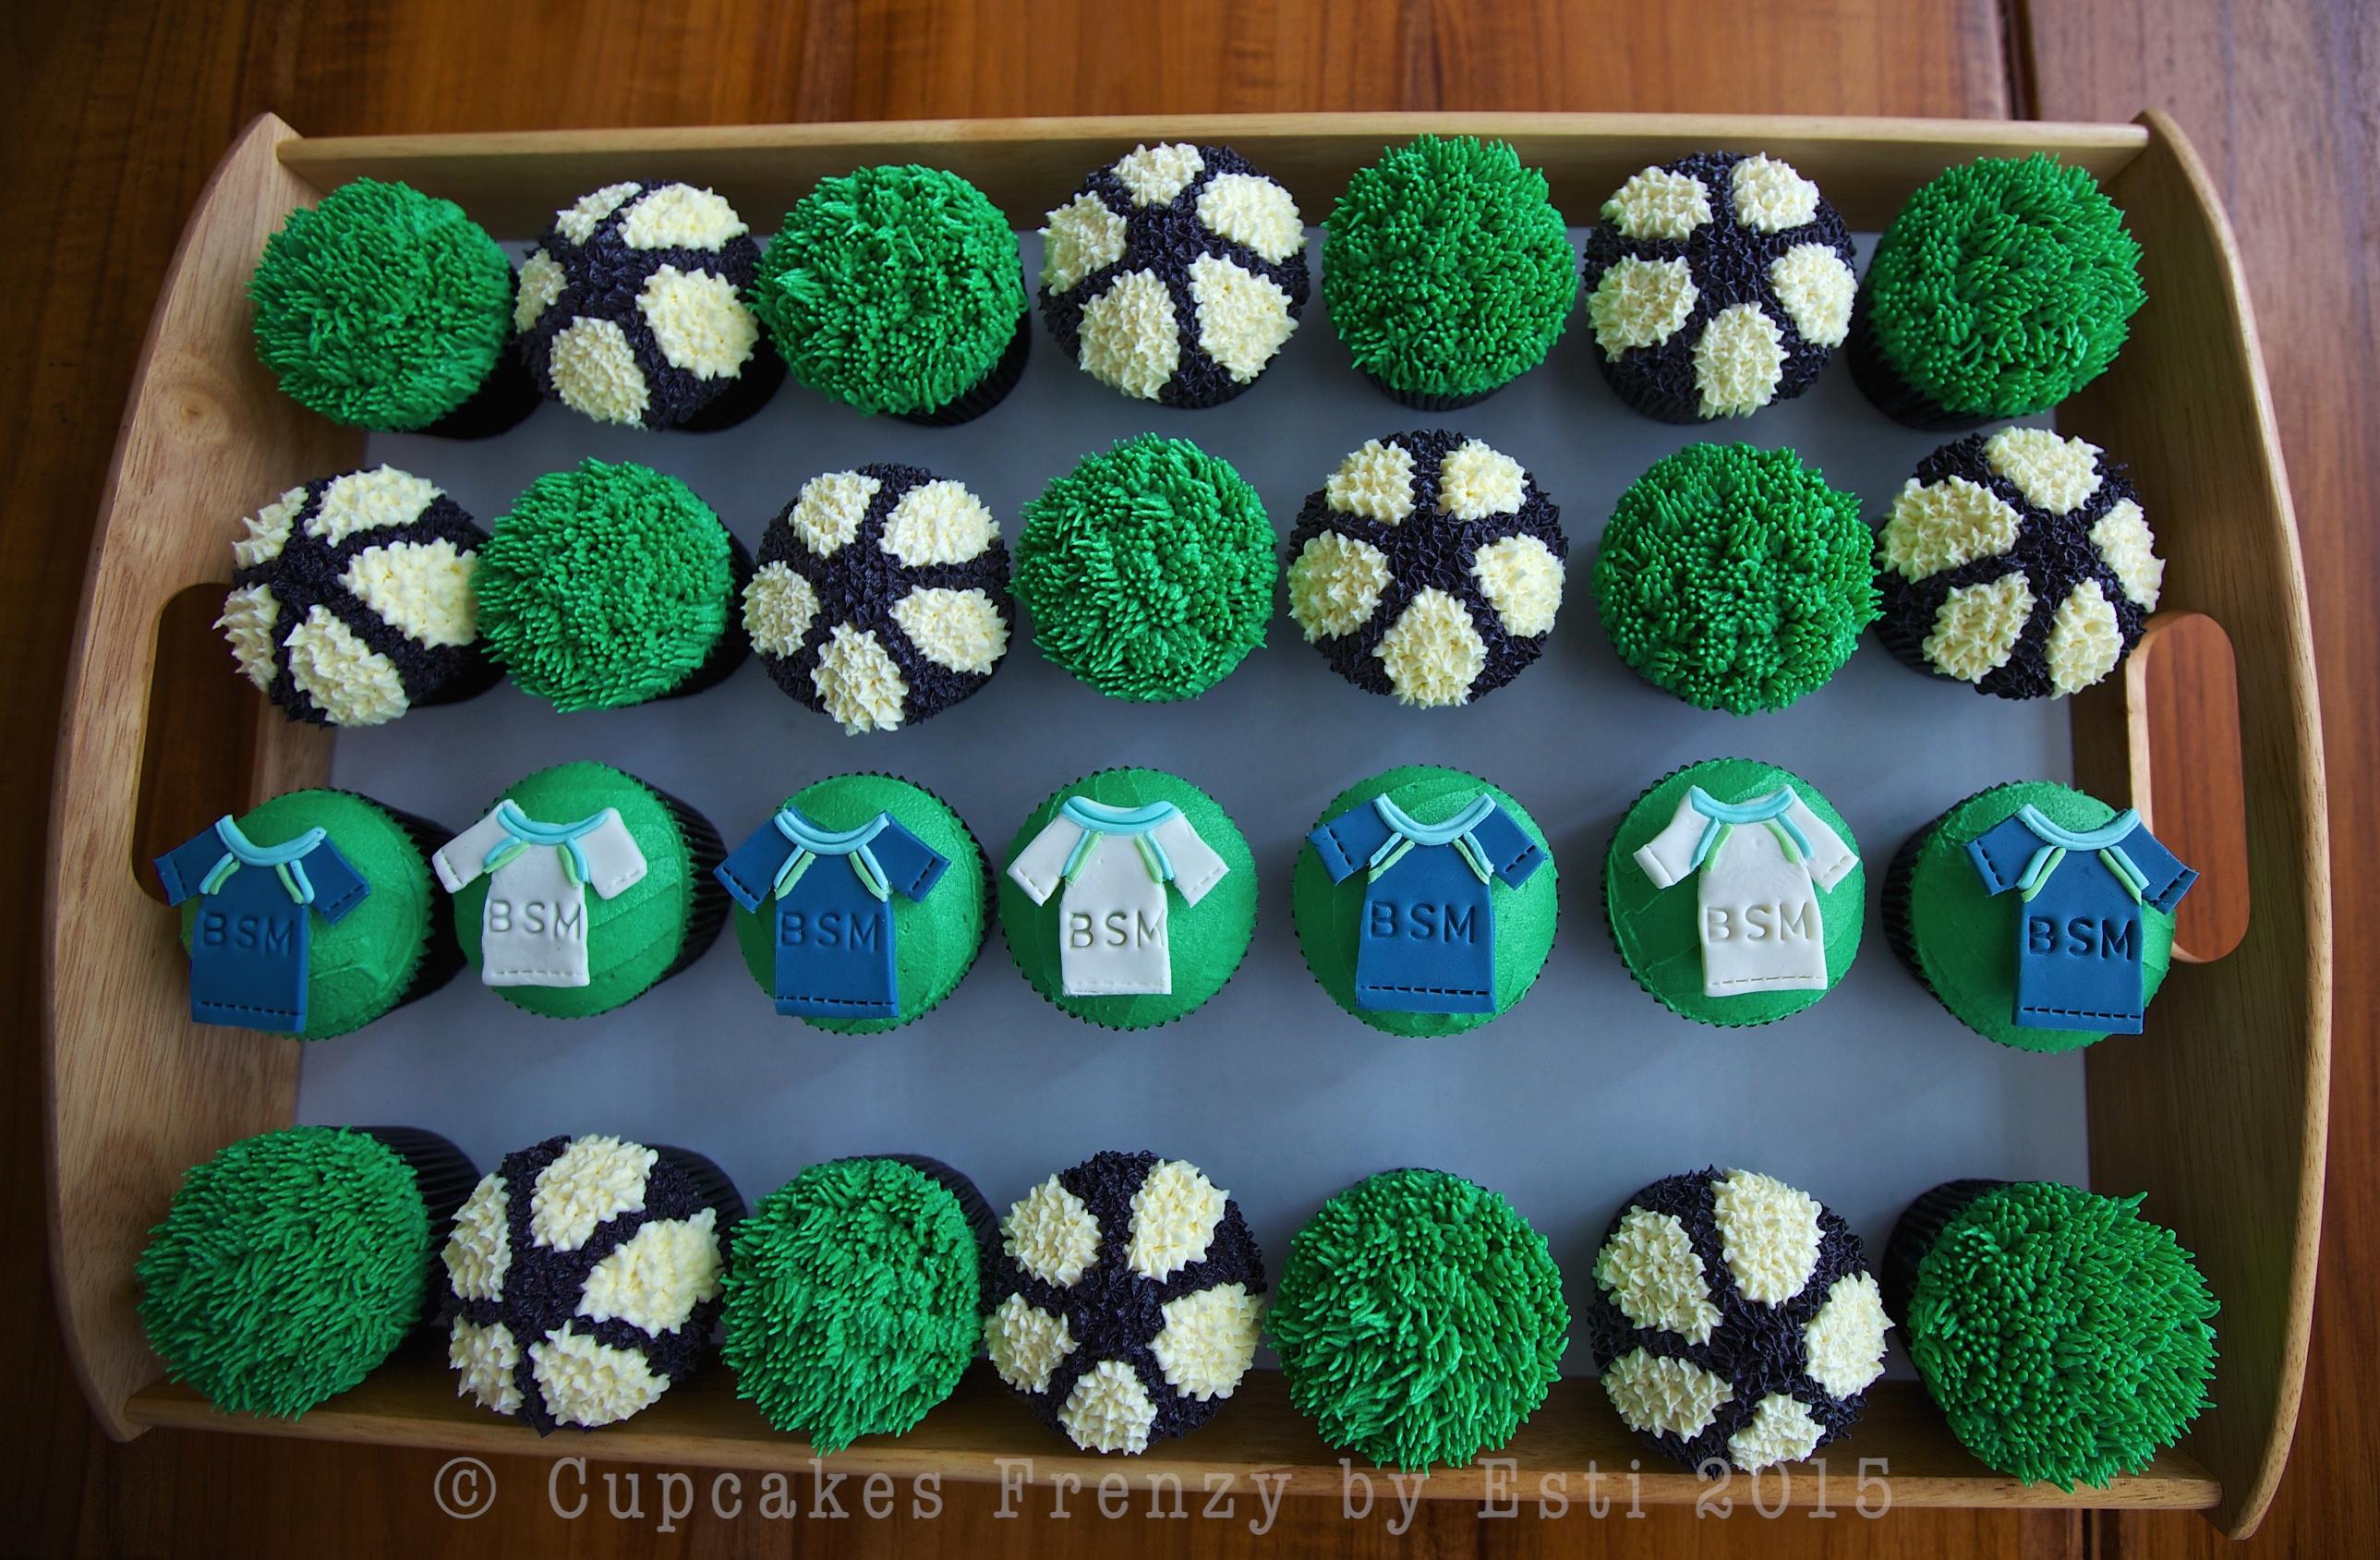 Football Cupcake Cupcakes Frenzy